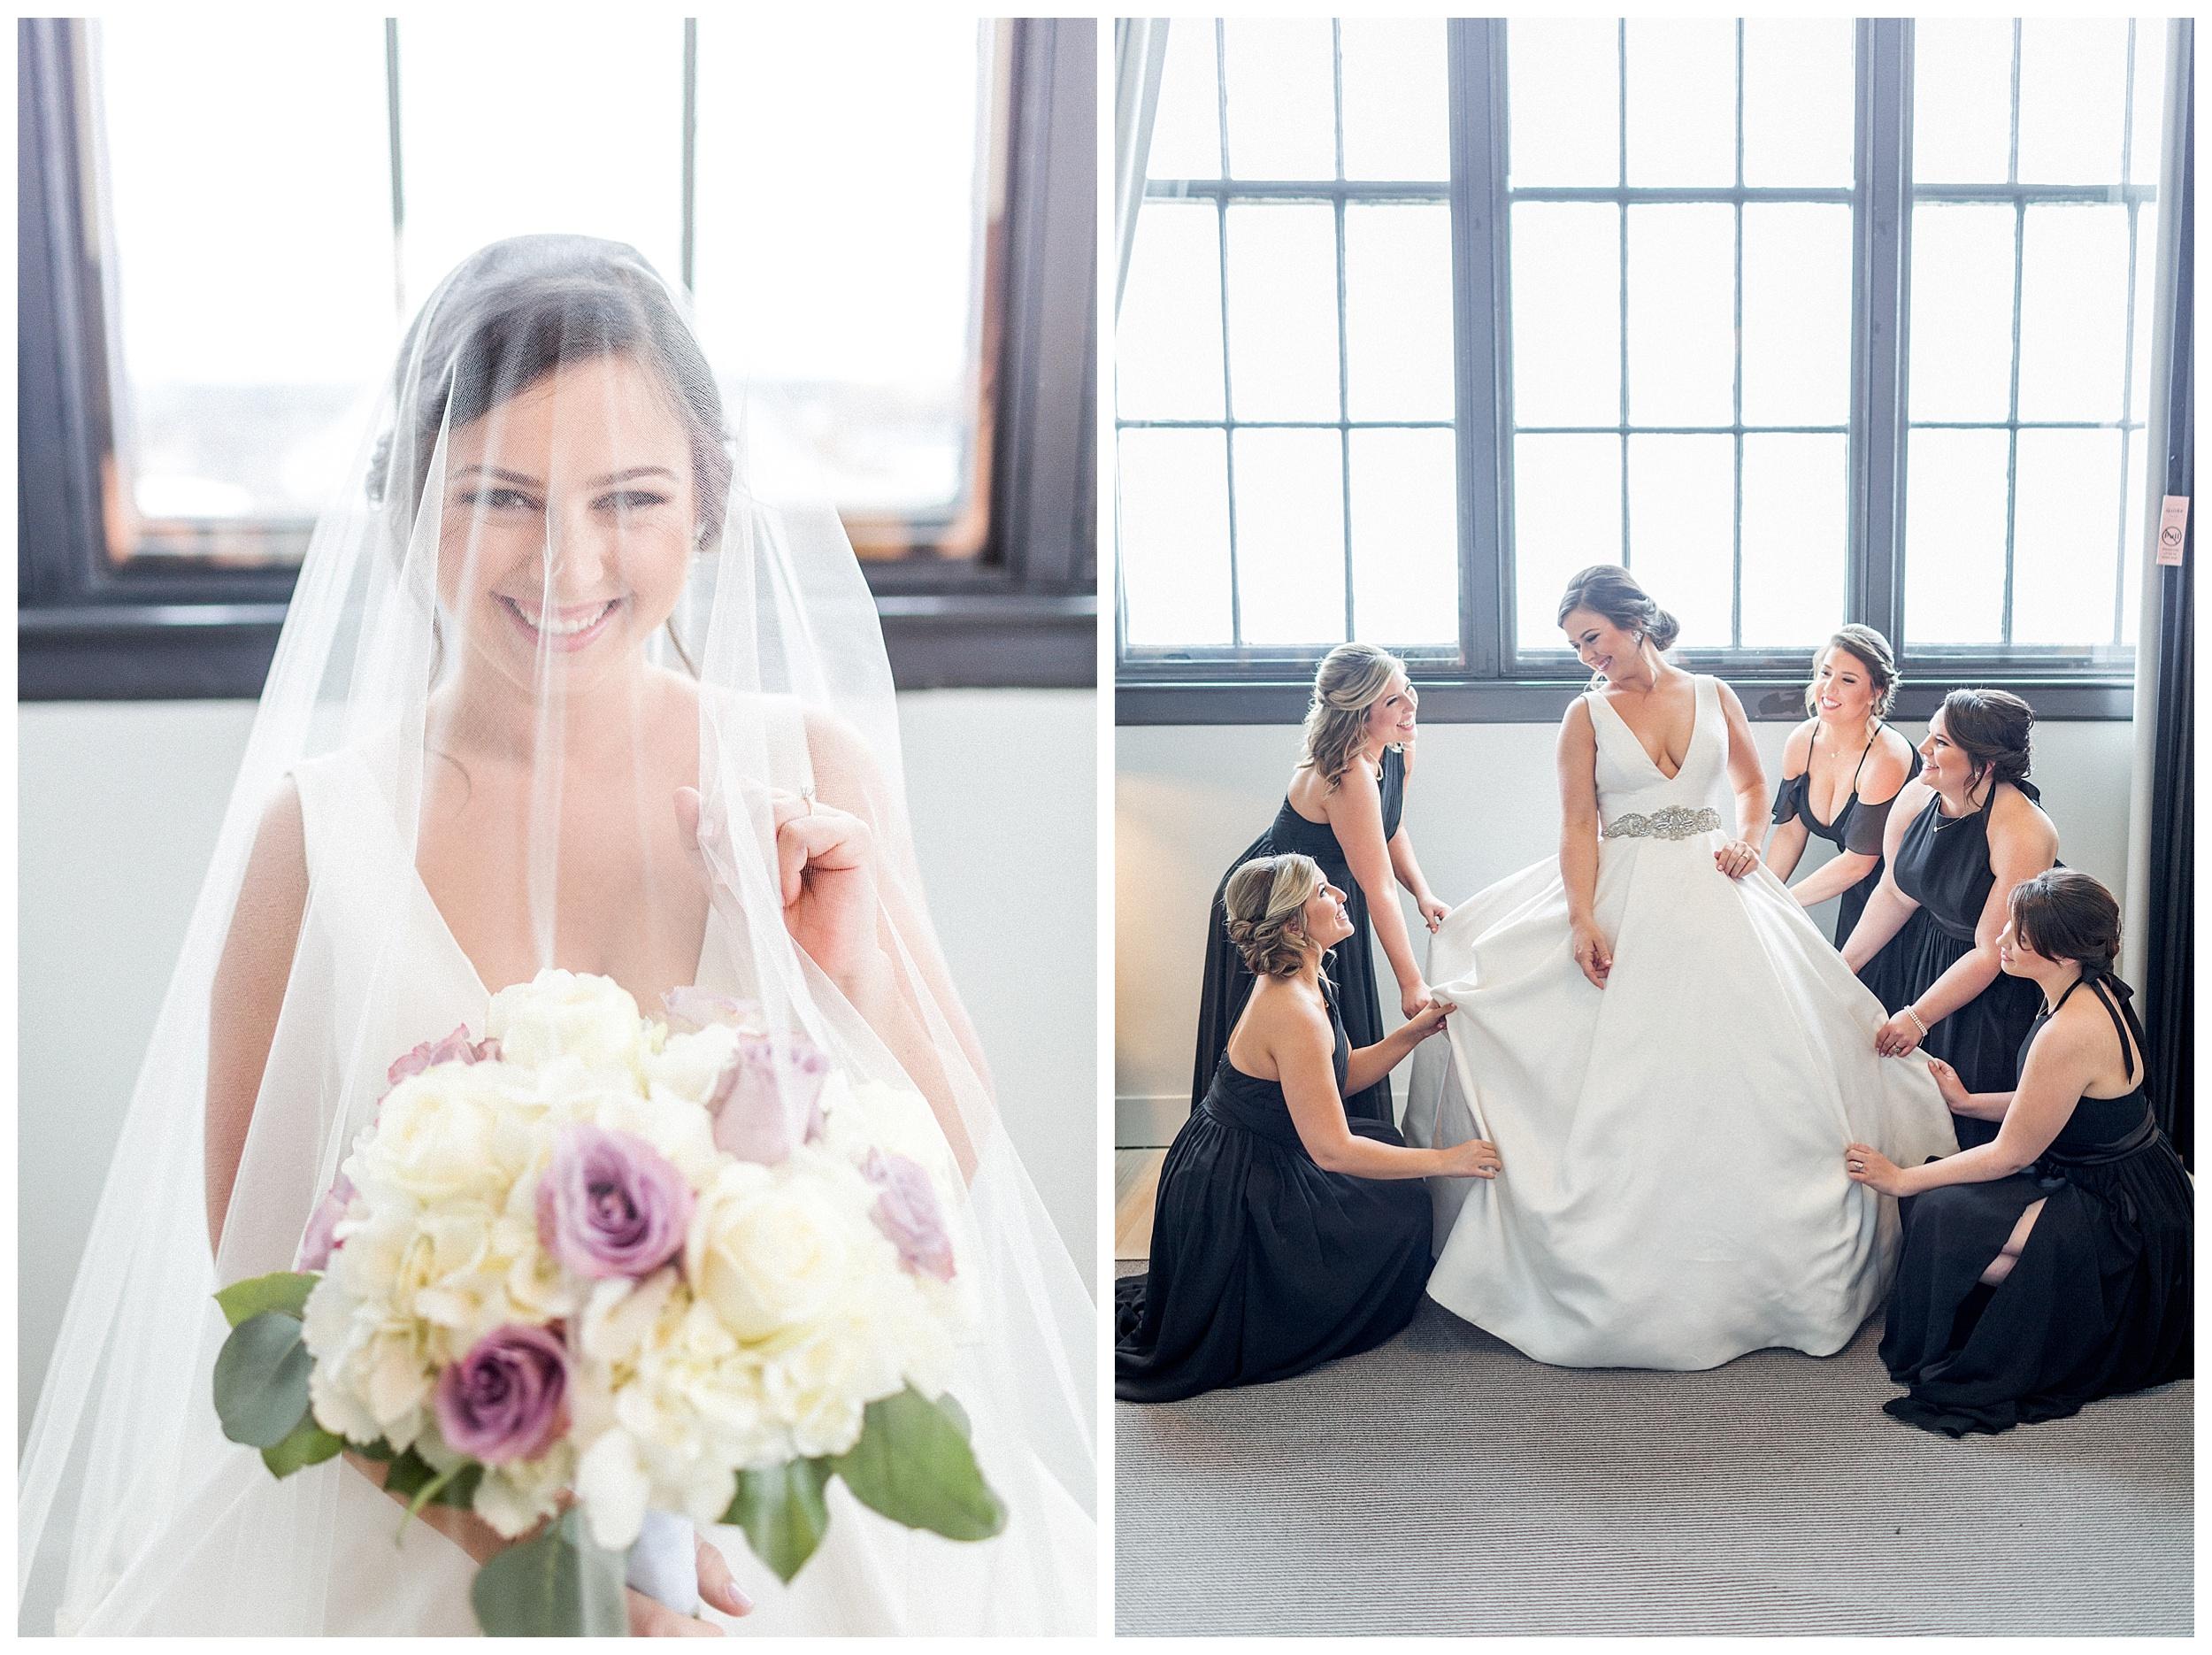 Country Club of Virginia Wedding | Richmond Wedding Photographer_0044.jpg